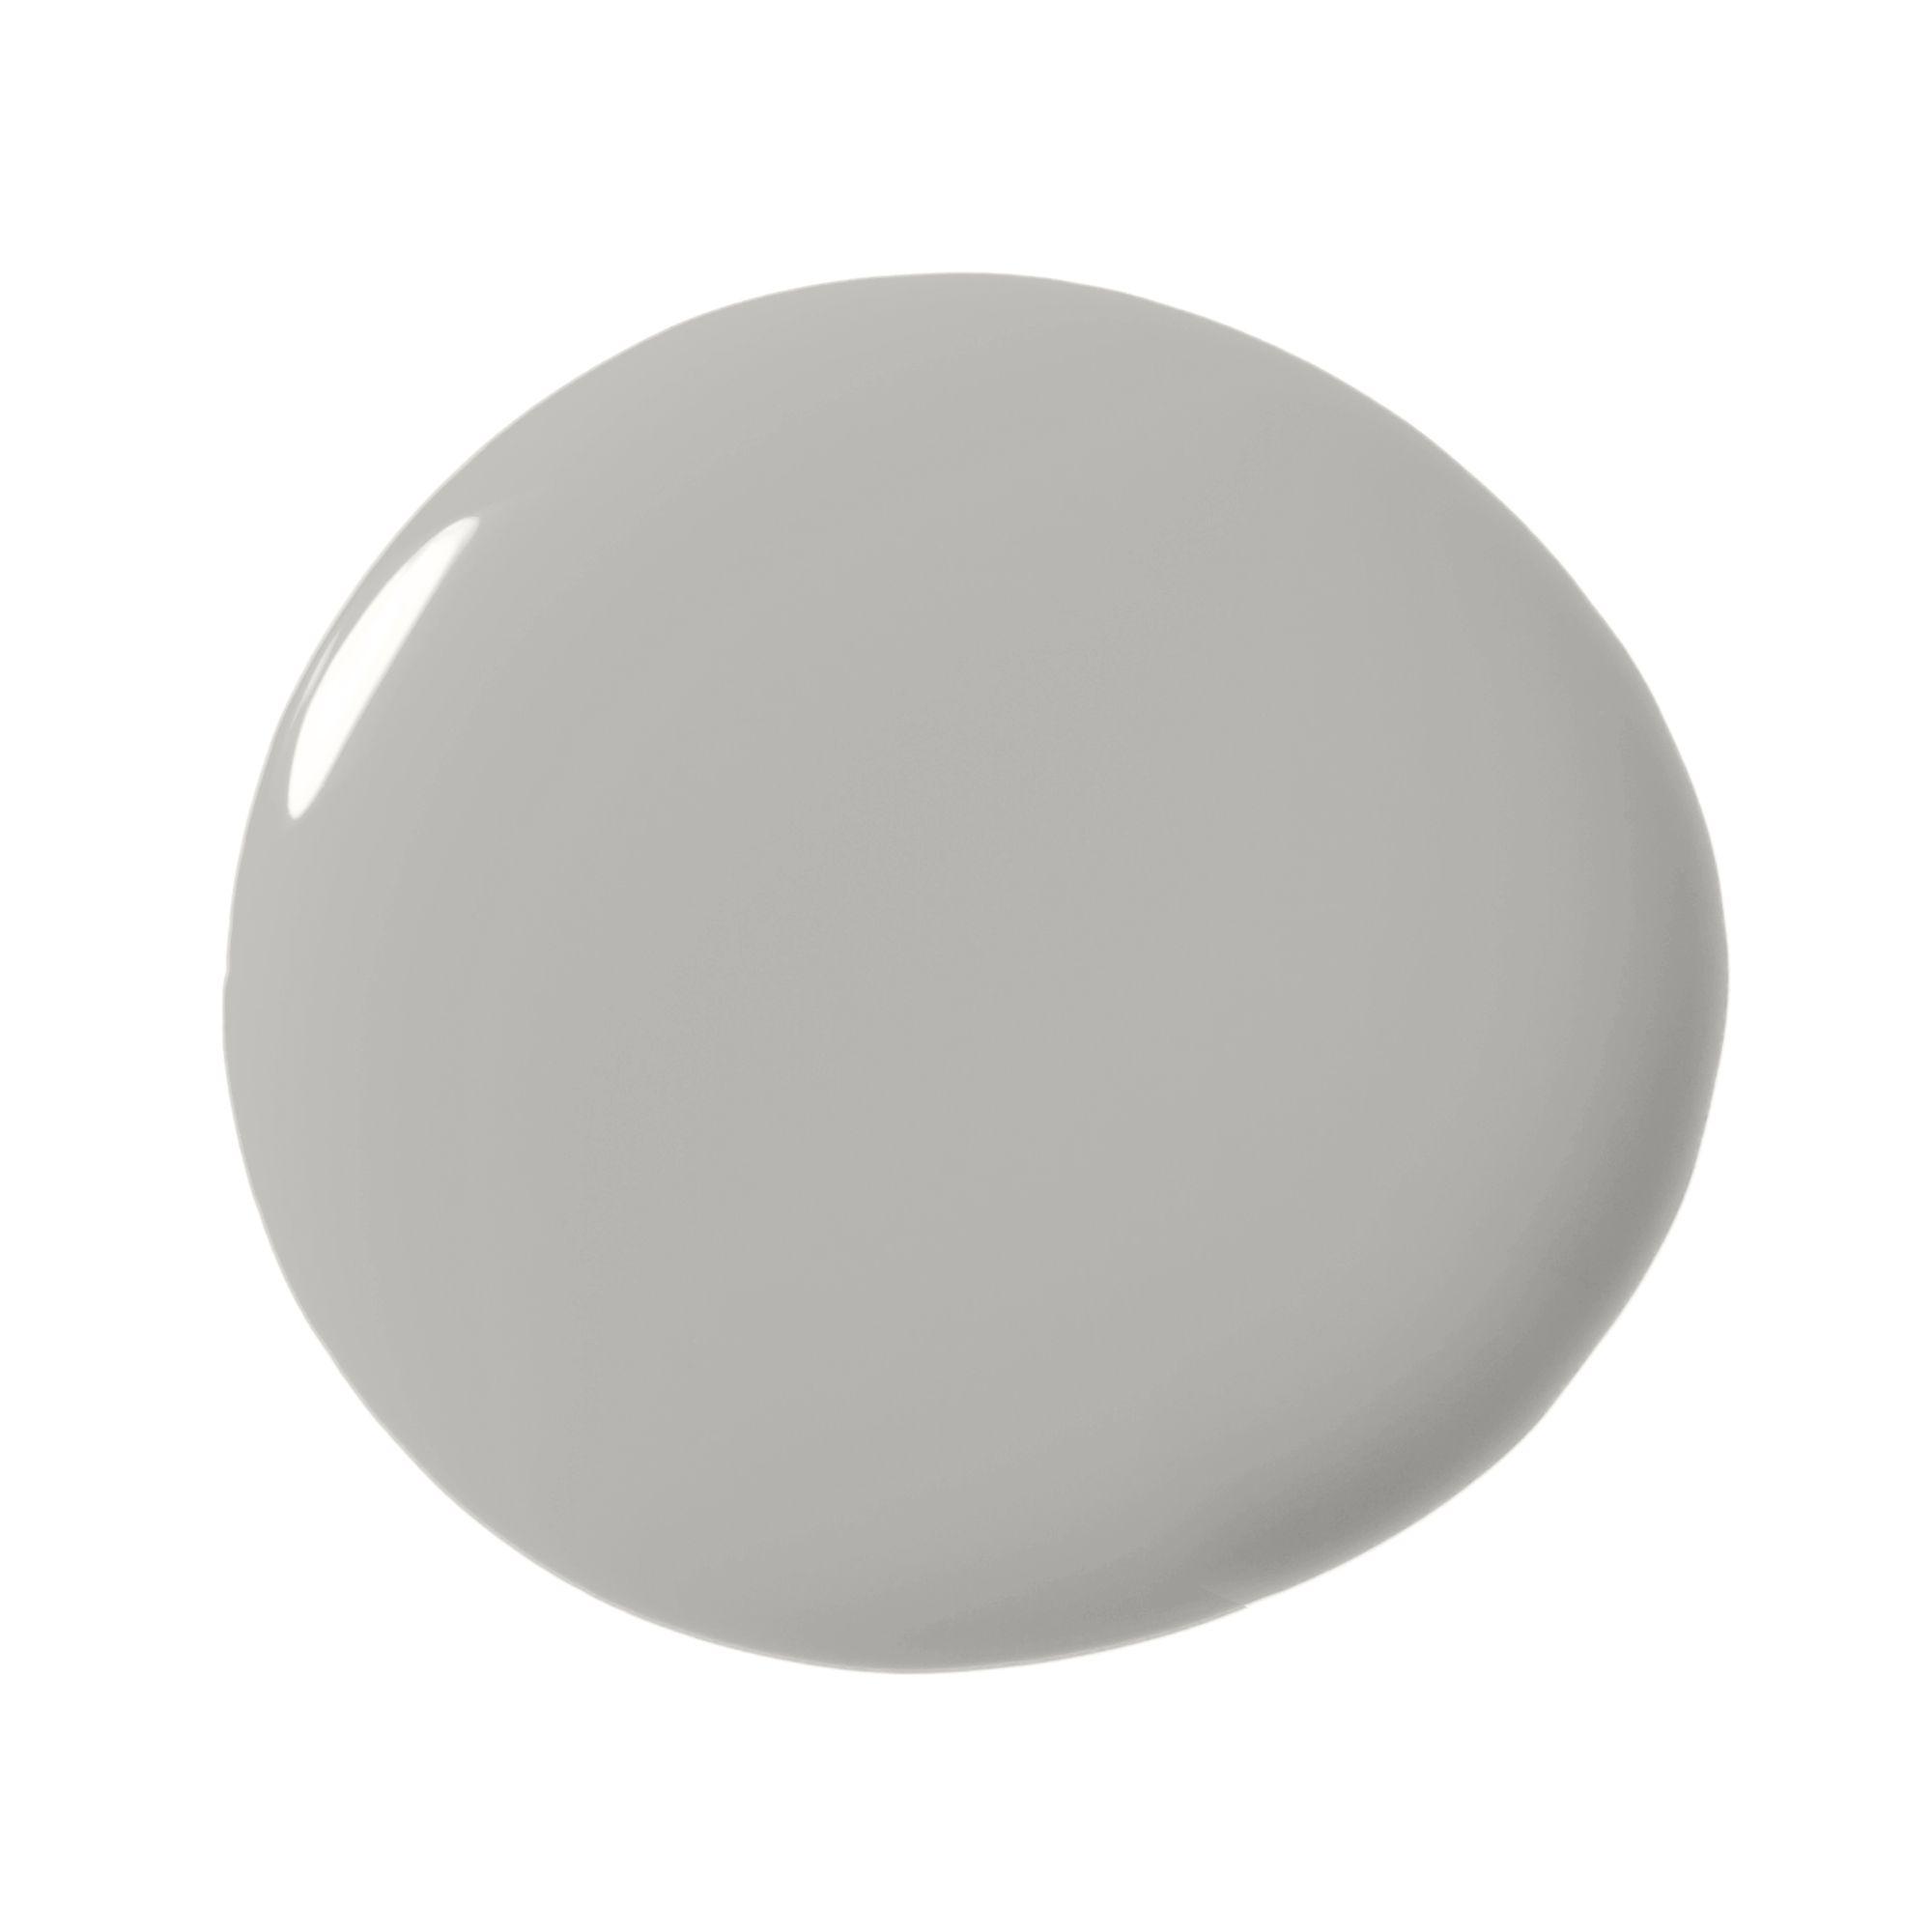 Innenfarbe im haus  interior designers on the best kitchen paint colors ever  paint